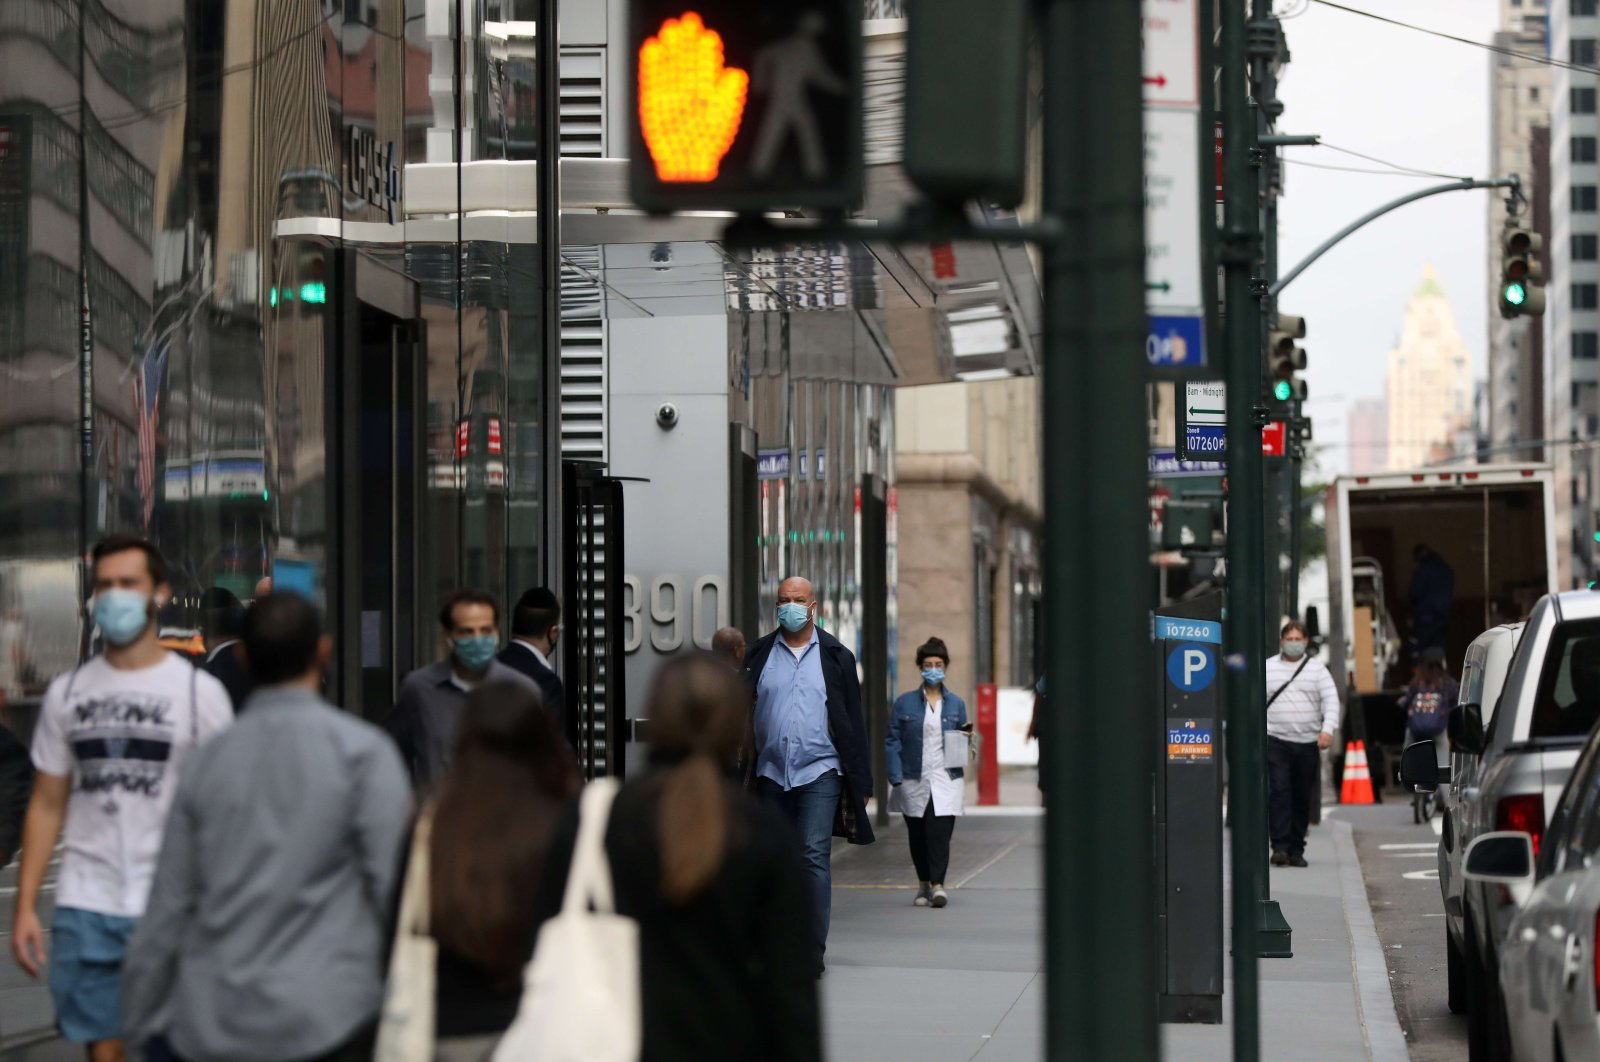 People walk through Manhattan, New York City, Oct. 21, 2020. (AFP Photo)